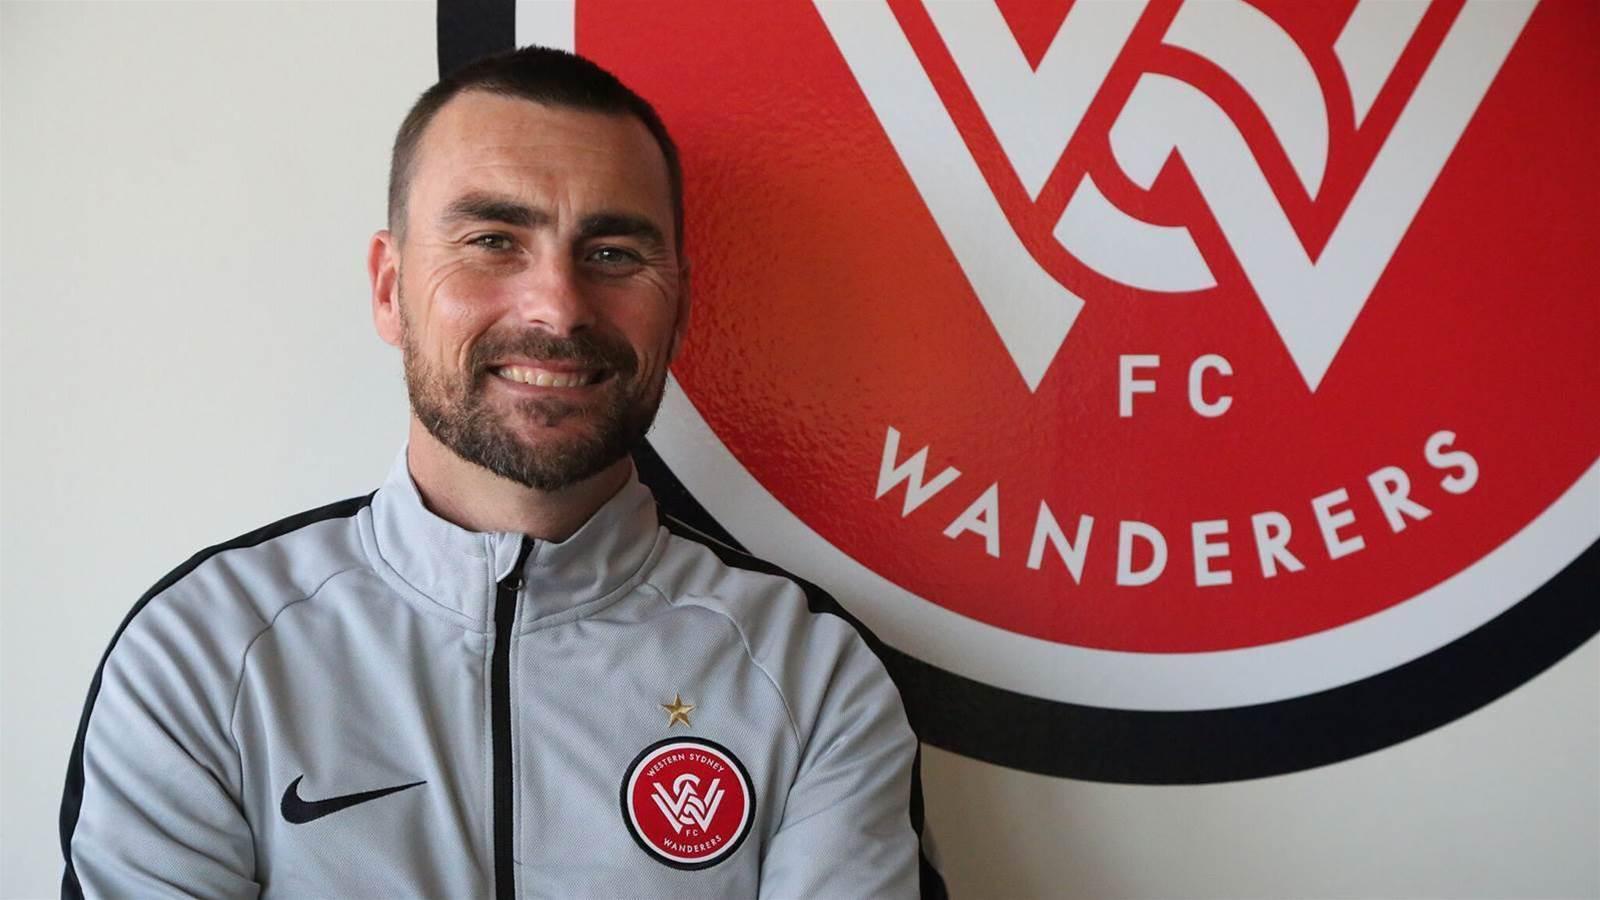 Western Sydney Wanderers appoint their new W-League coach